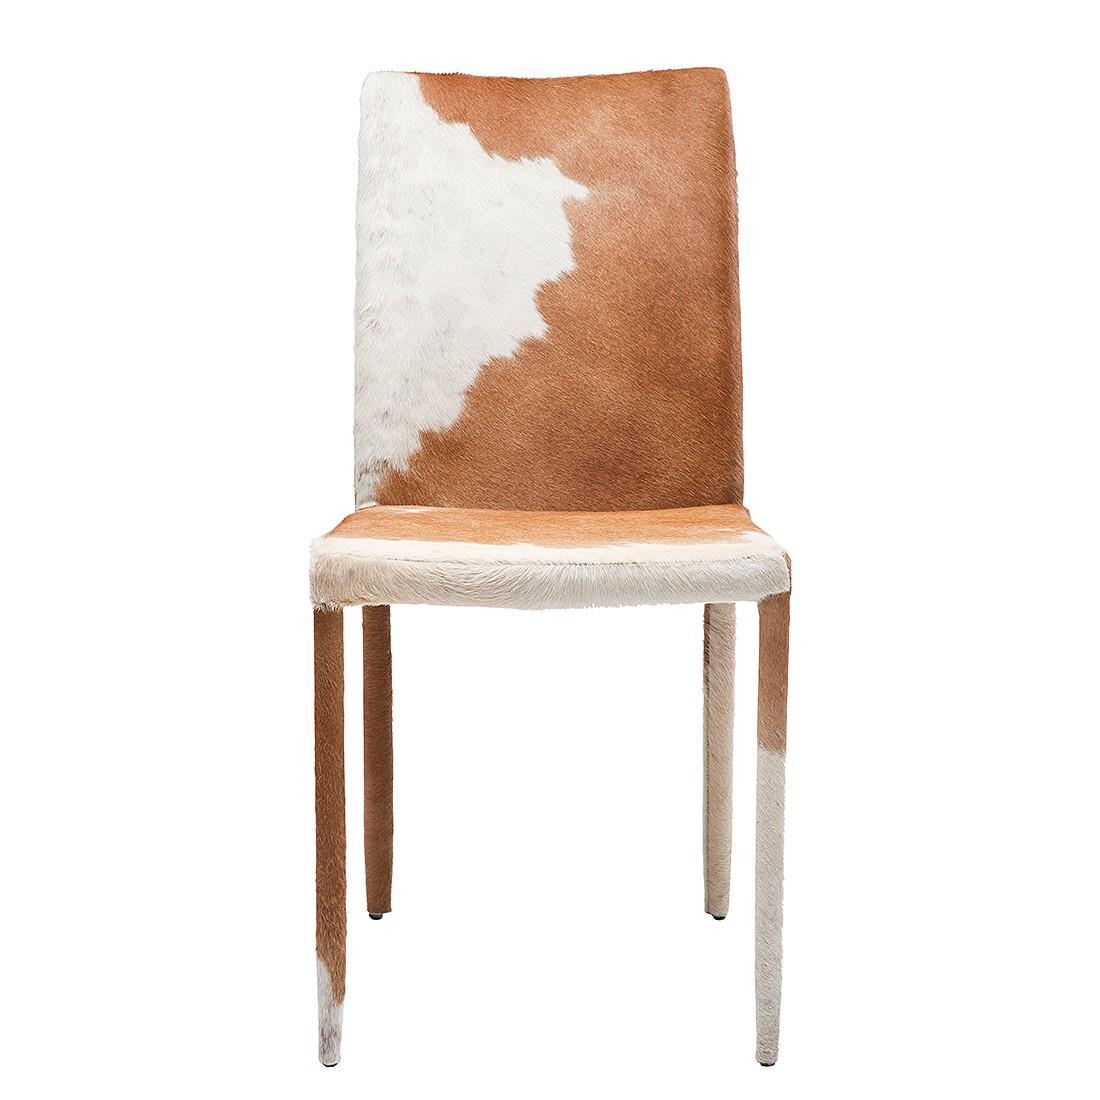 stuhl vacco braunes fell kare design m kd 100038. Black Bedroom Furniture Sets. Home Design Ideas